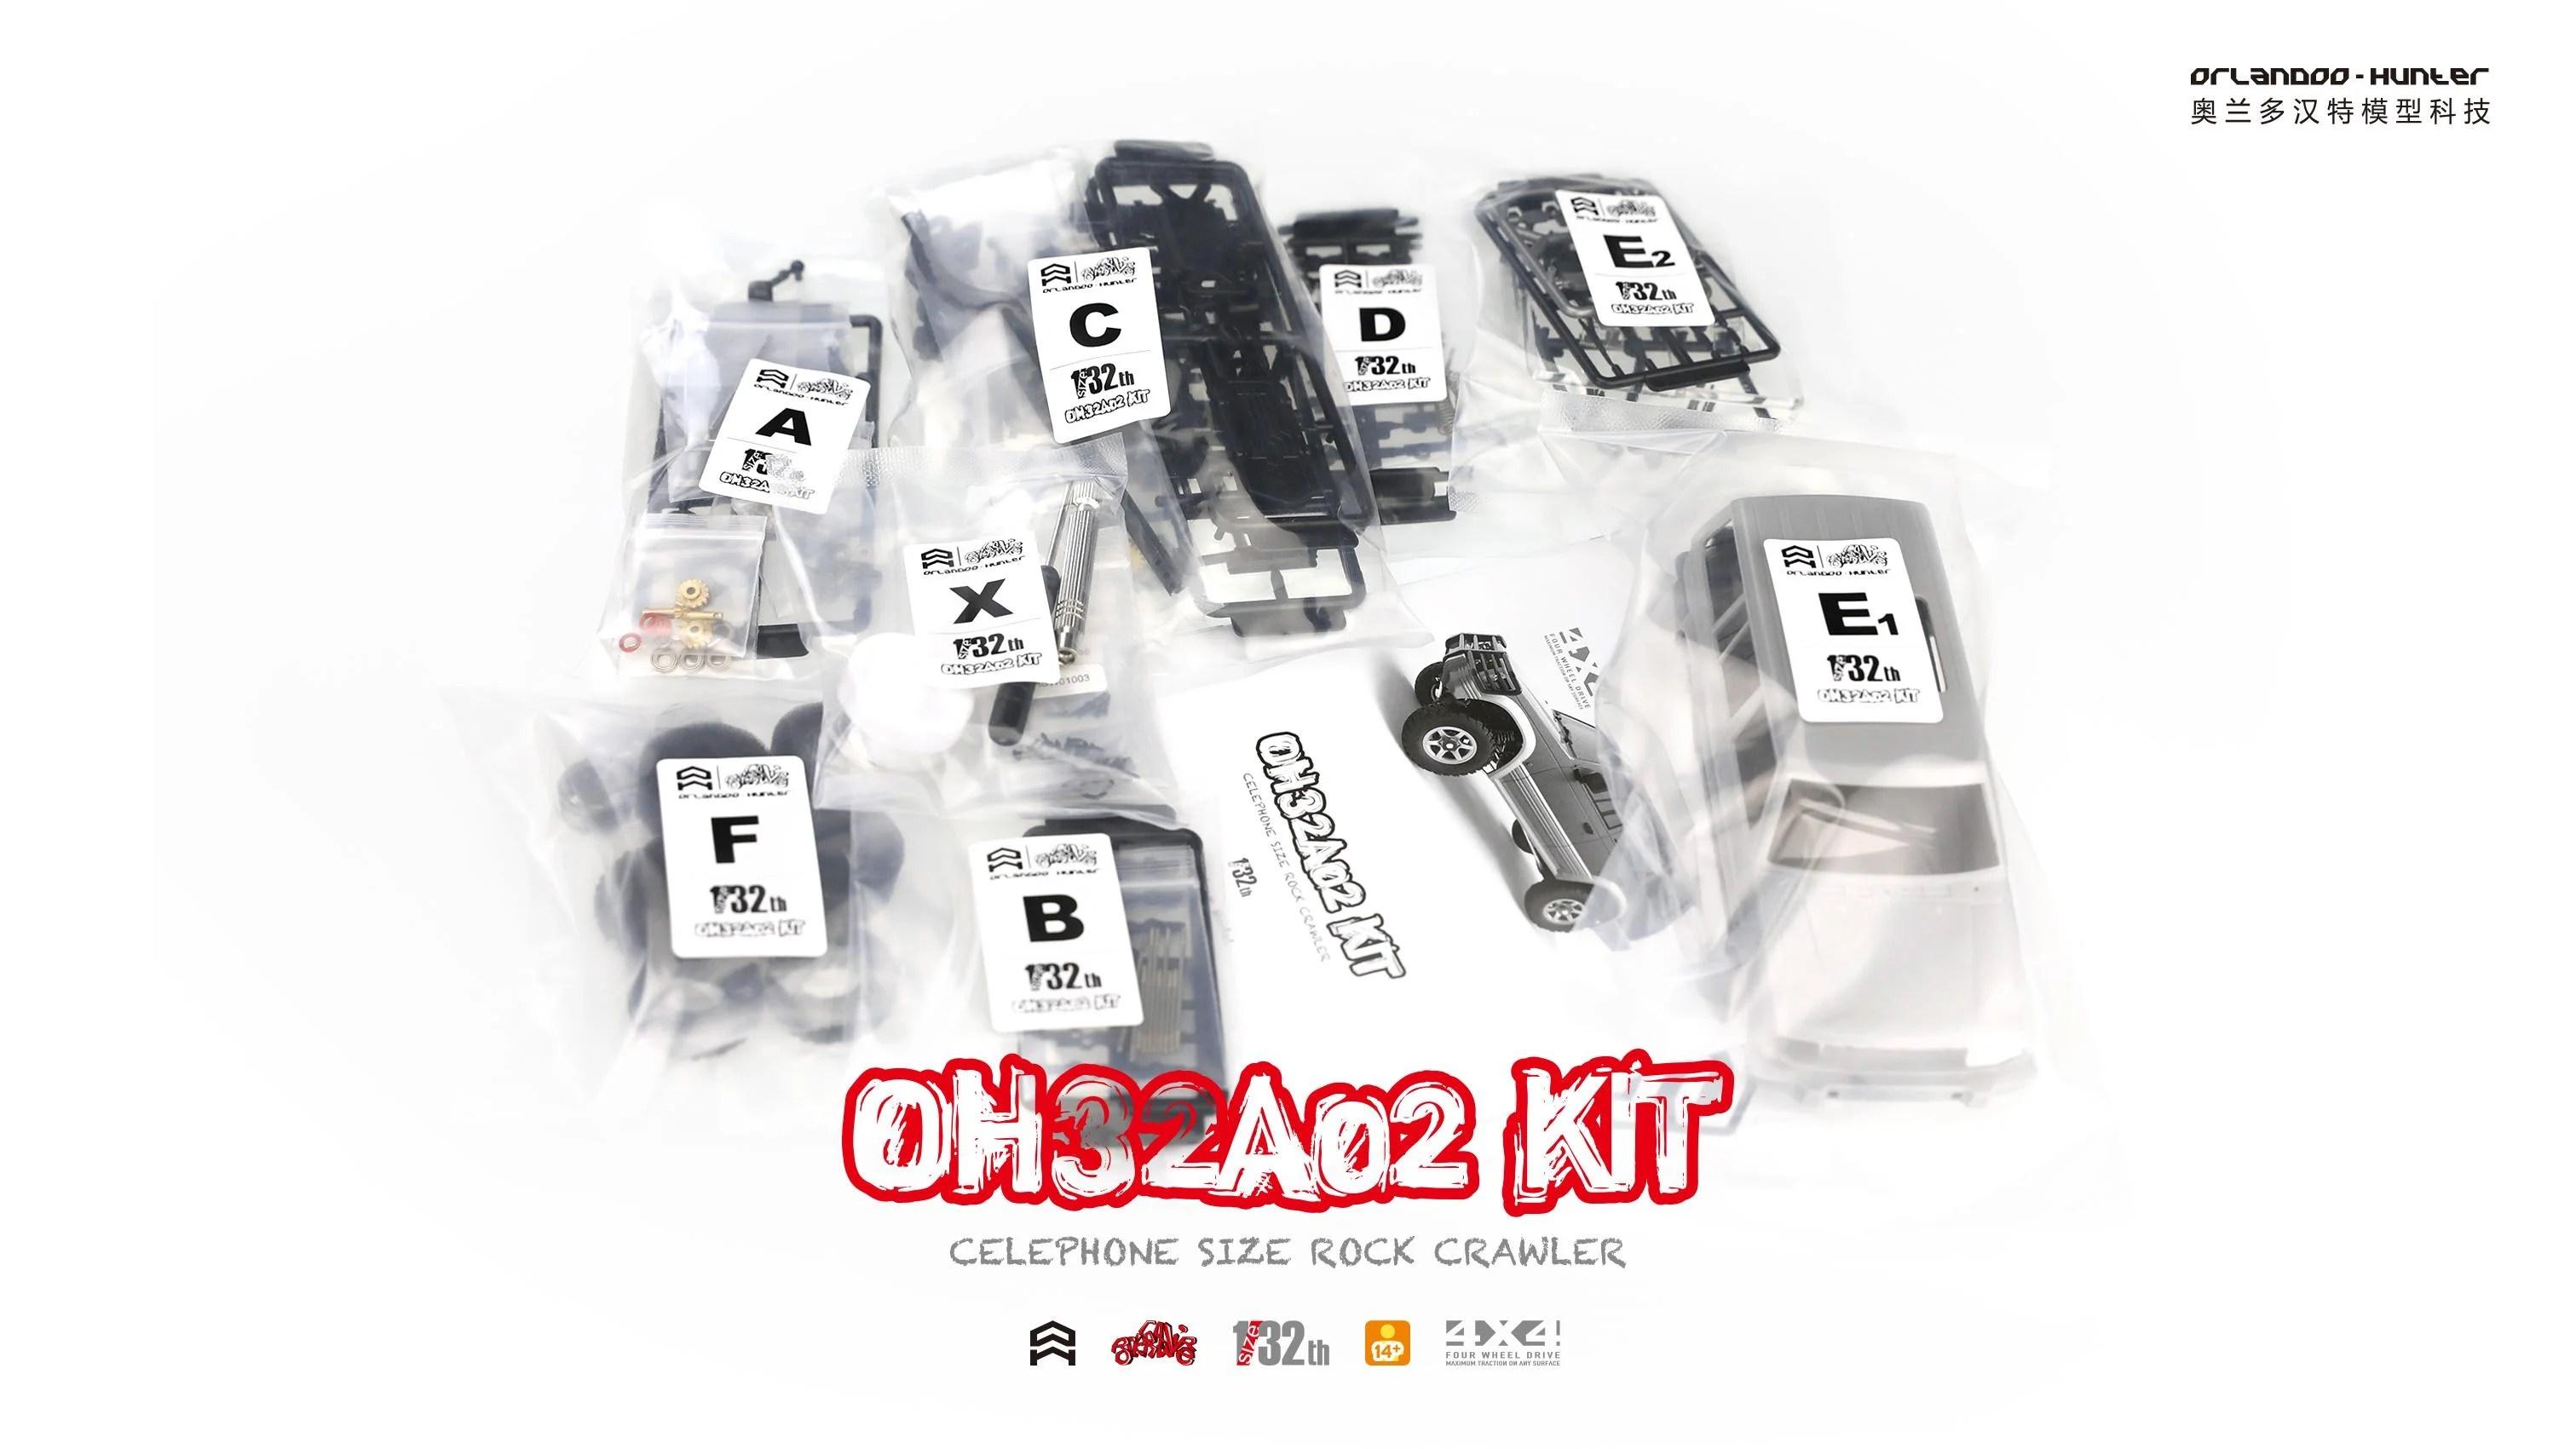 Orlandoo Hunter Oh32a02 1 32 Micro Crawler Kit Mitsubishi Pajero